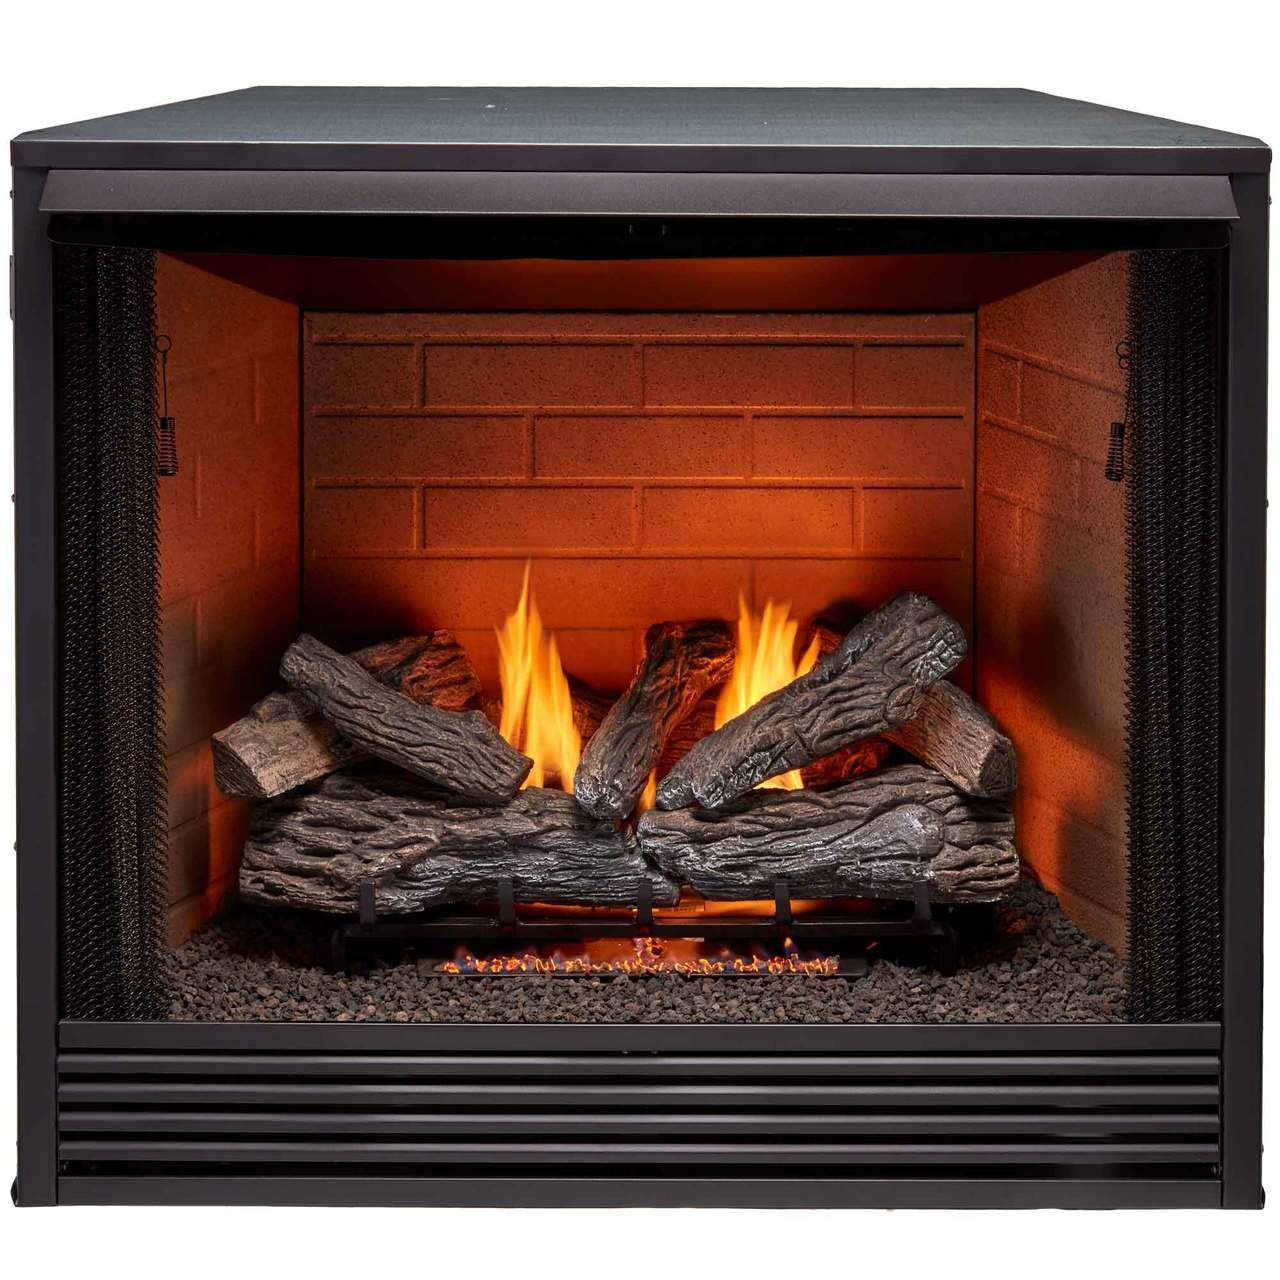 Duluth Forge PC36VFC Universal Ventless Firebox, 36 Inch, Black by ProCom Heating